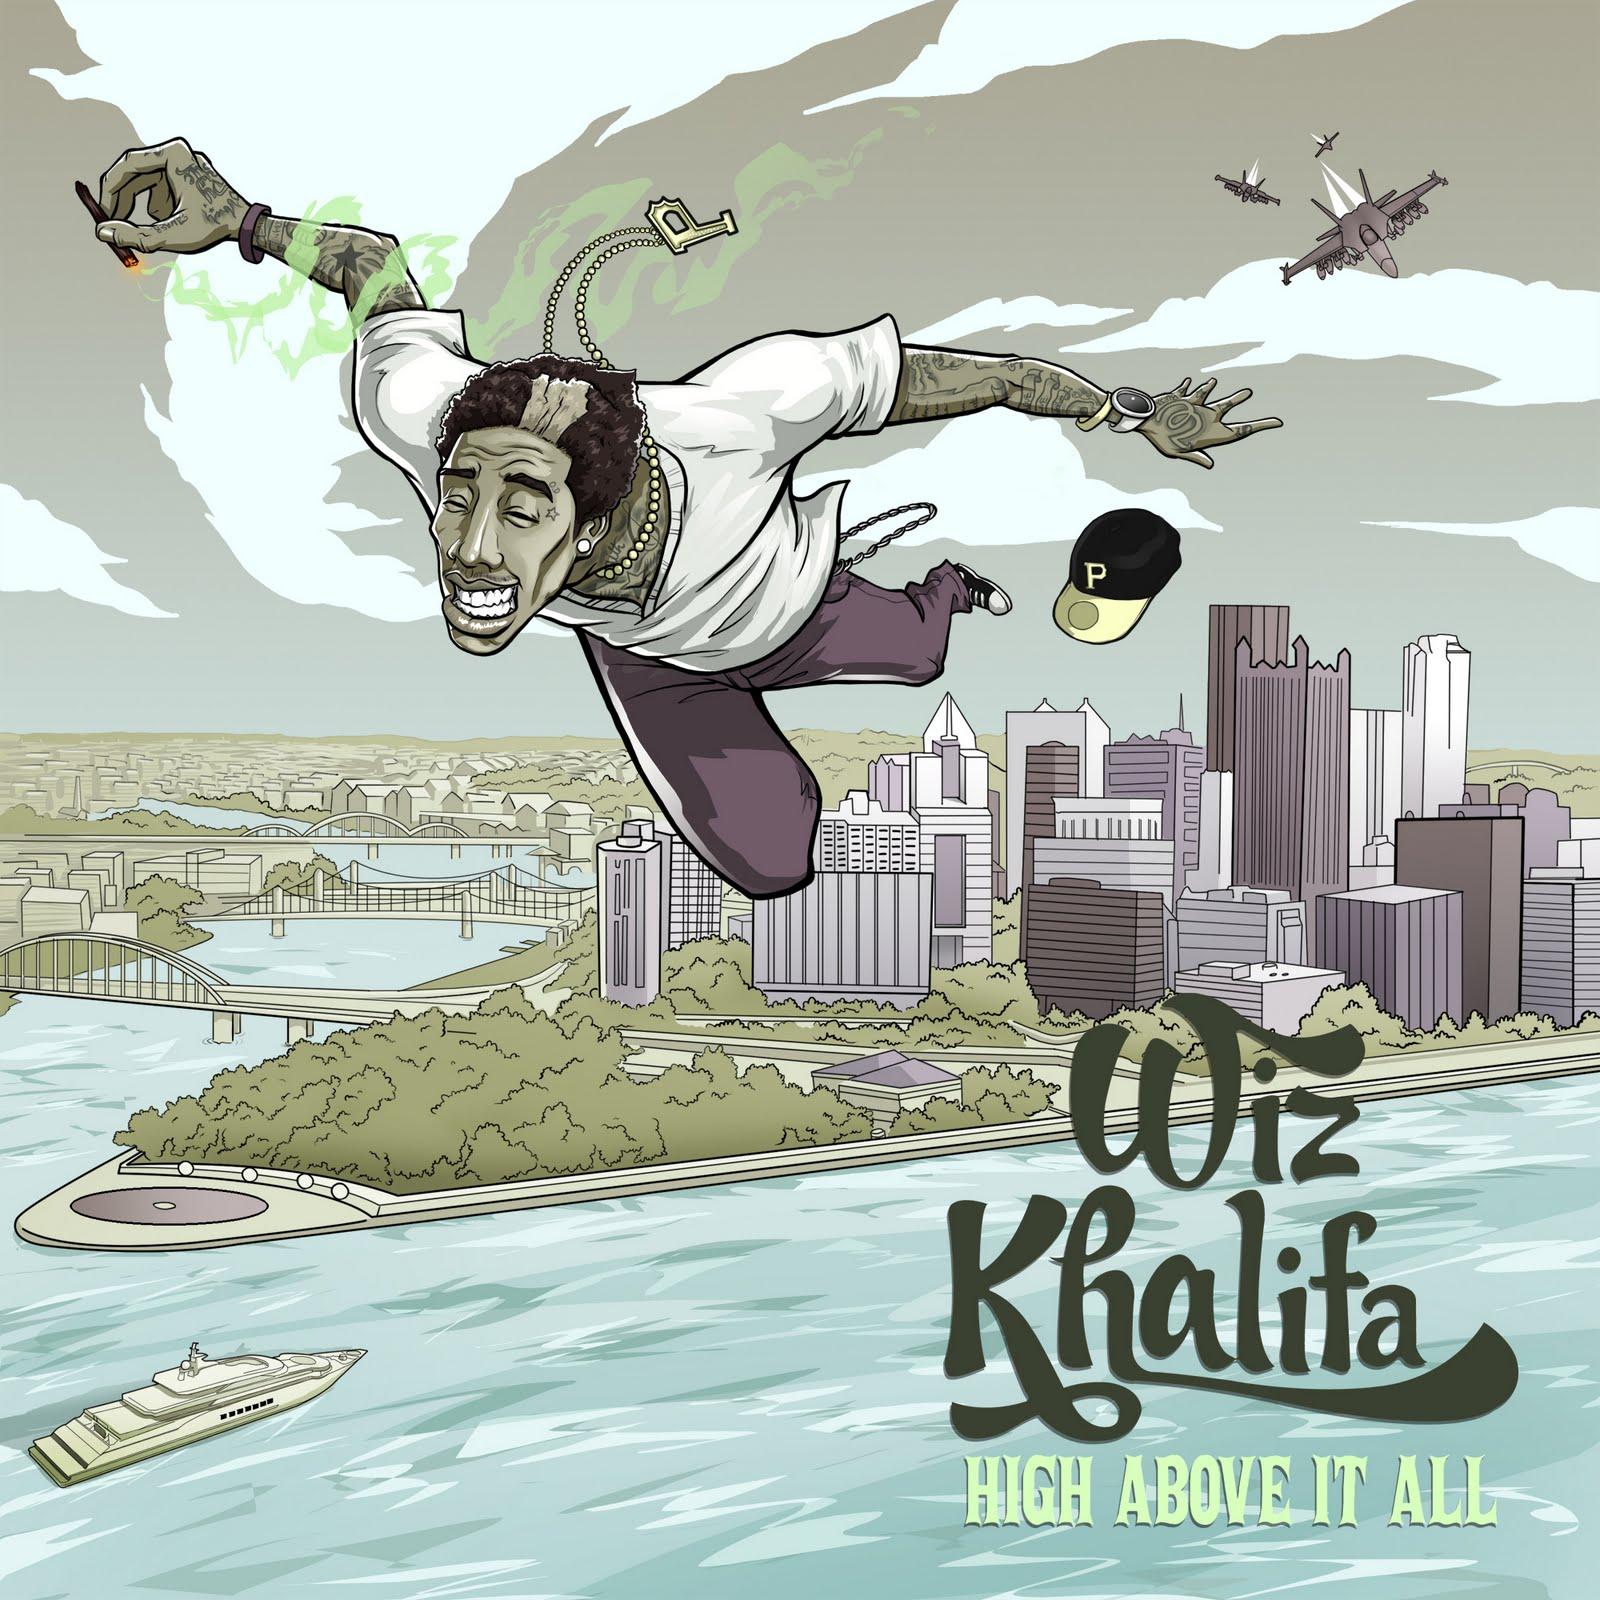 Wiz khalifa discography download.